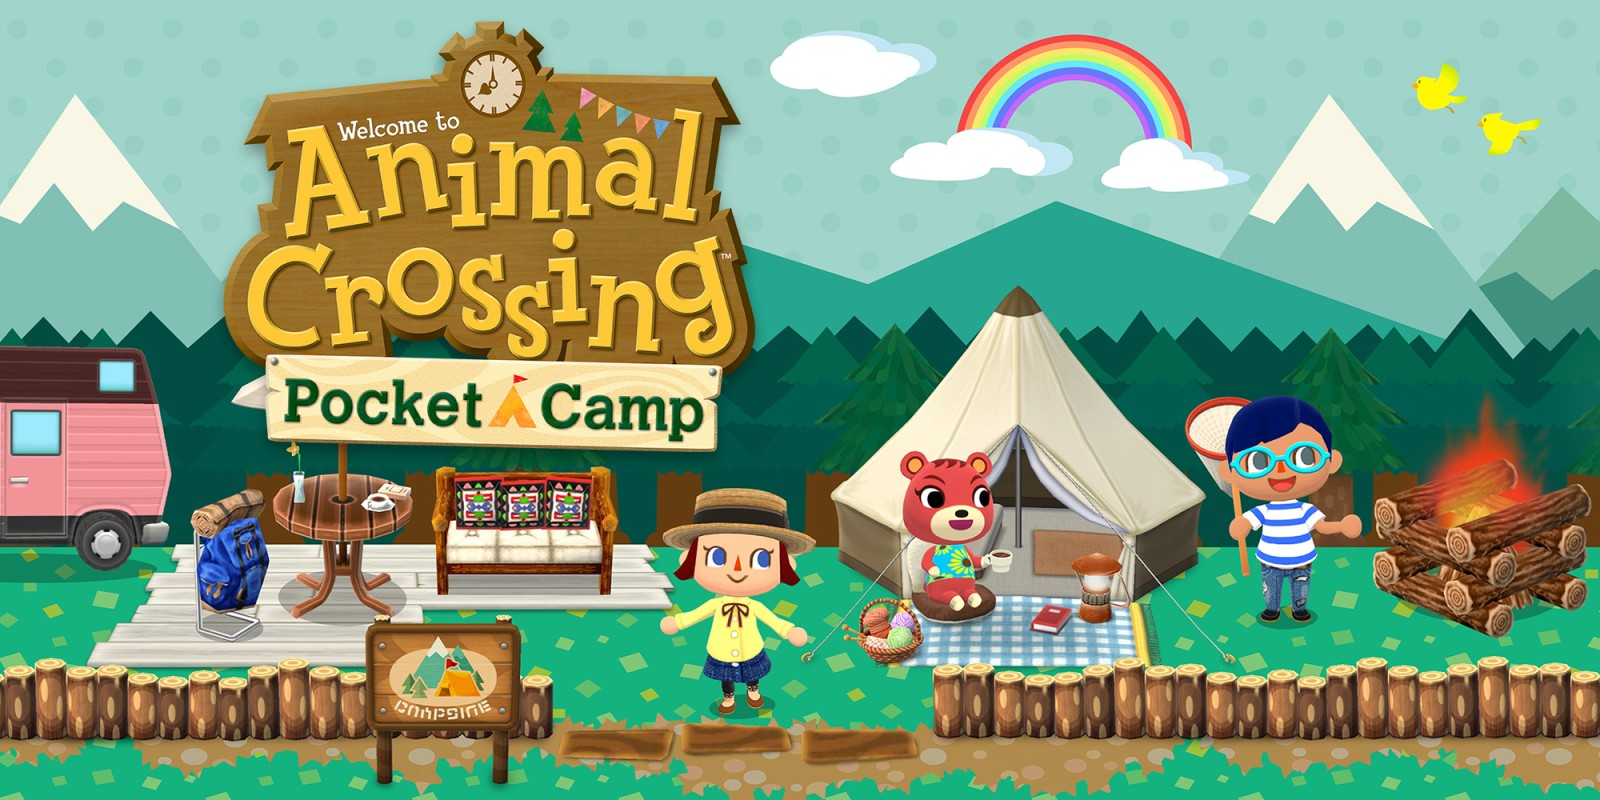 AnimalCrossingPocketCamp_image1600w